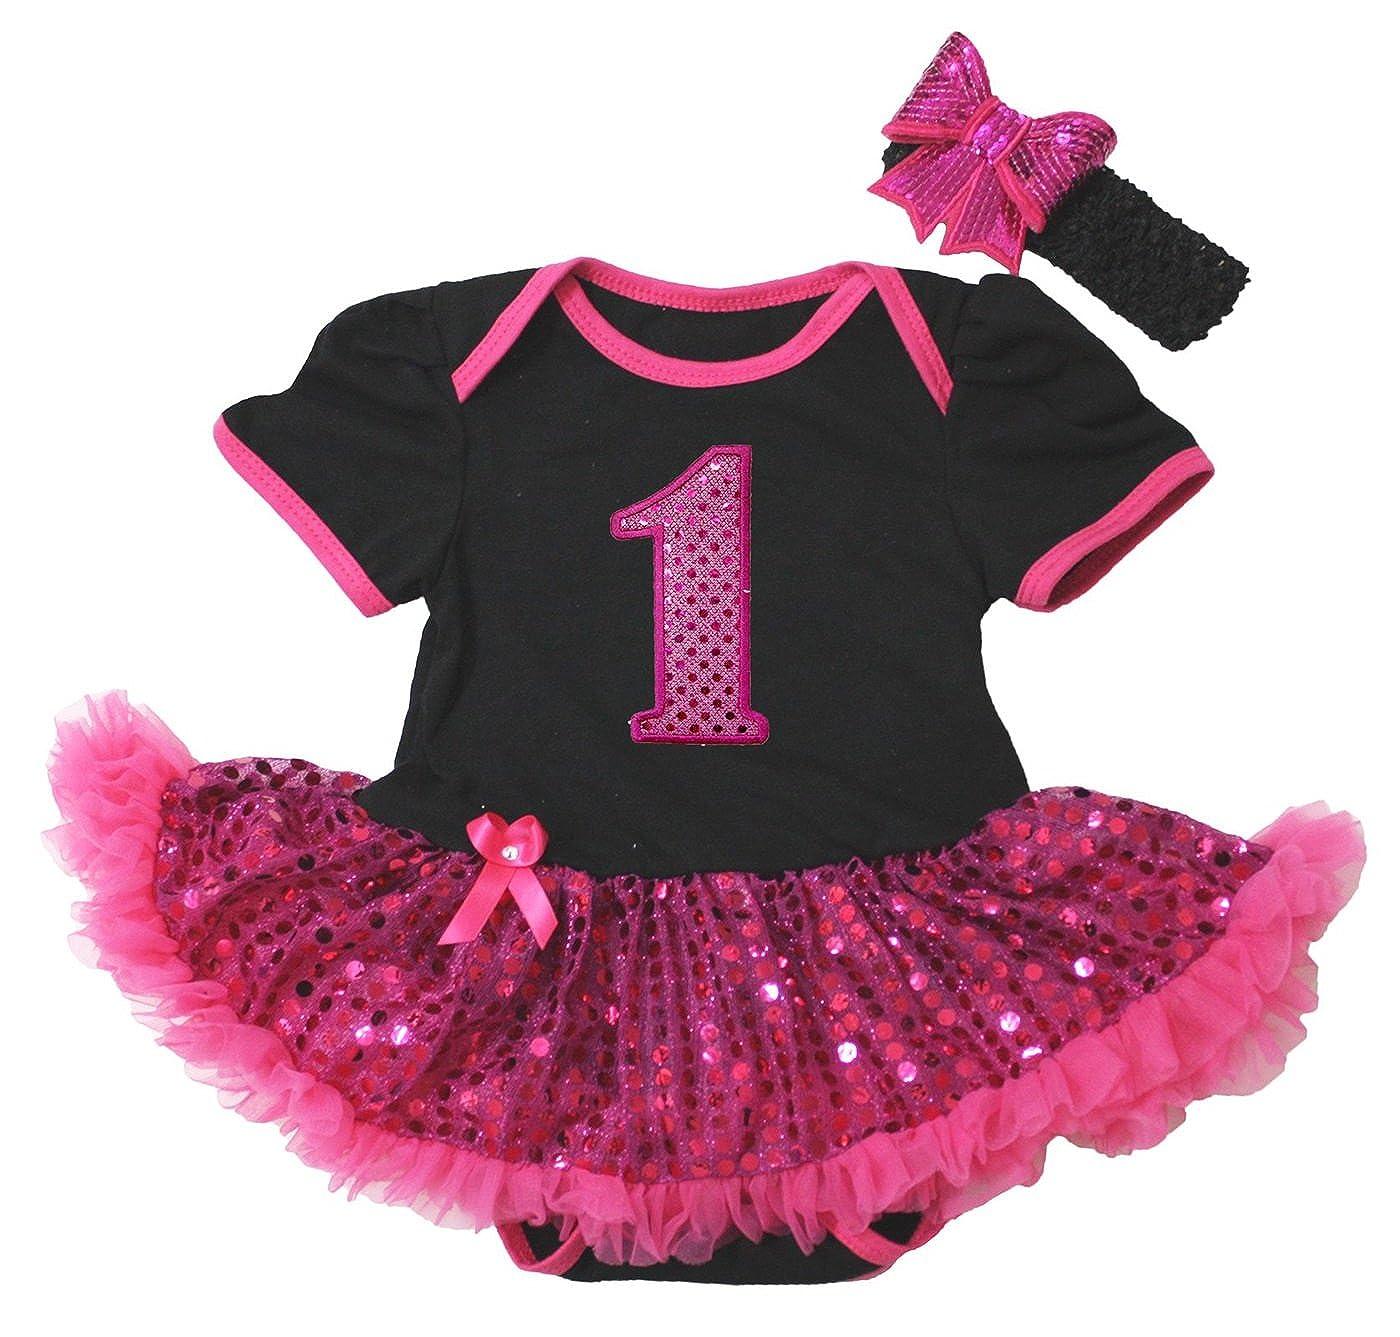 Bling 1st Birthday Black Bodysuit Hot Pink Sequins Girl Cloth Baby Dress Nb-18m JT060